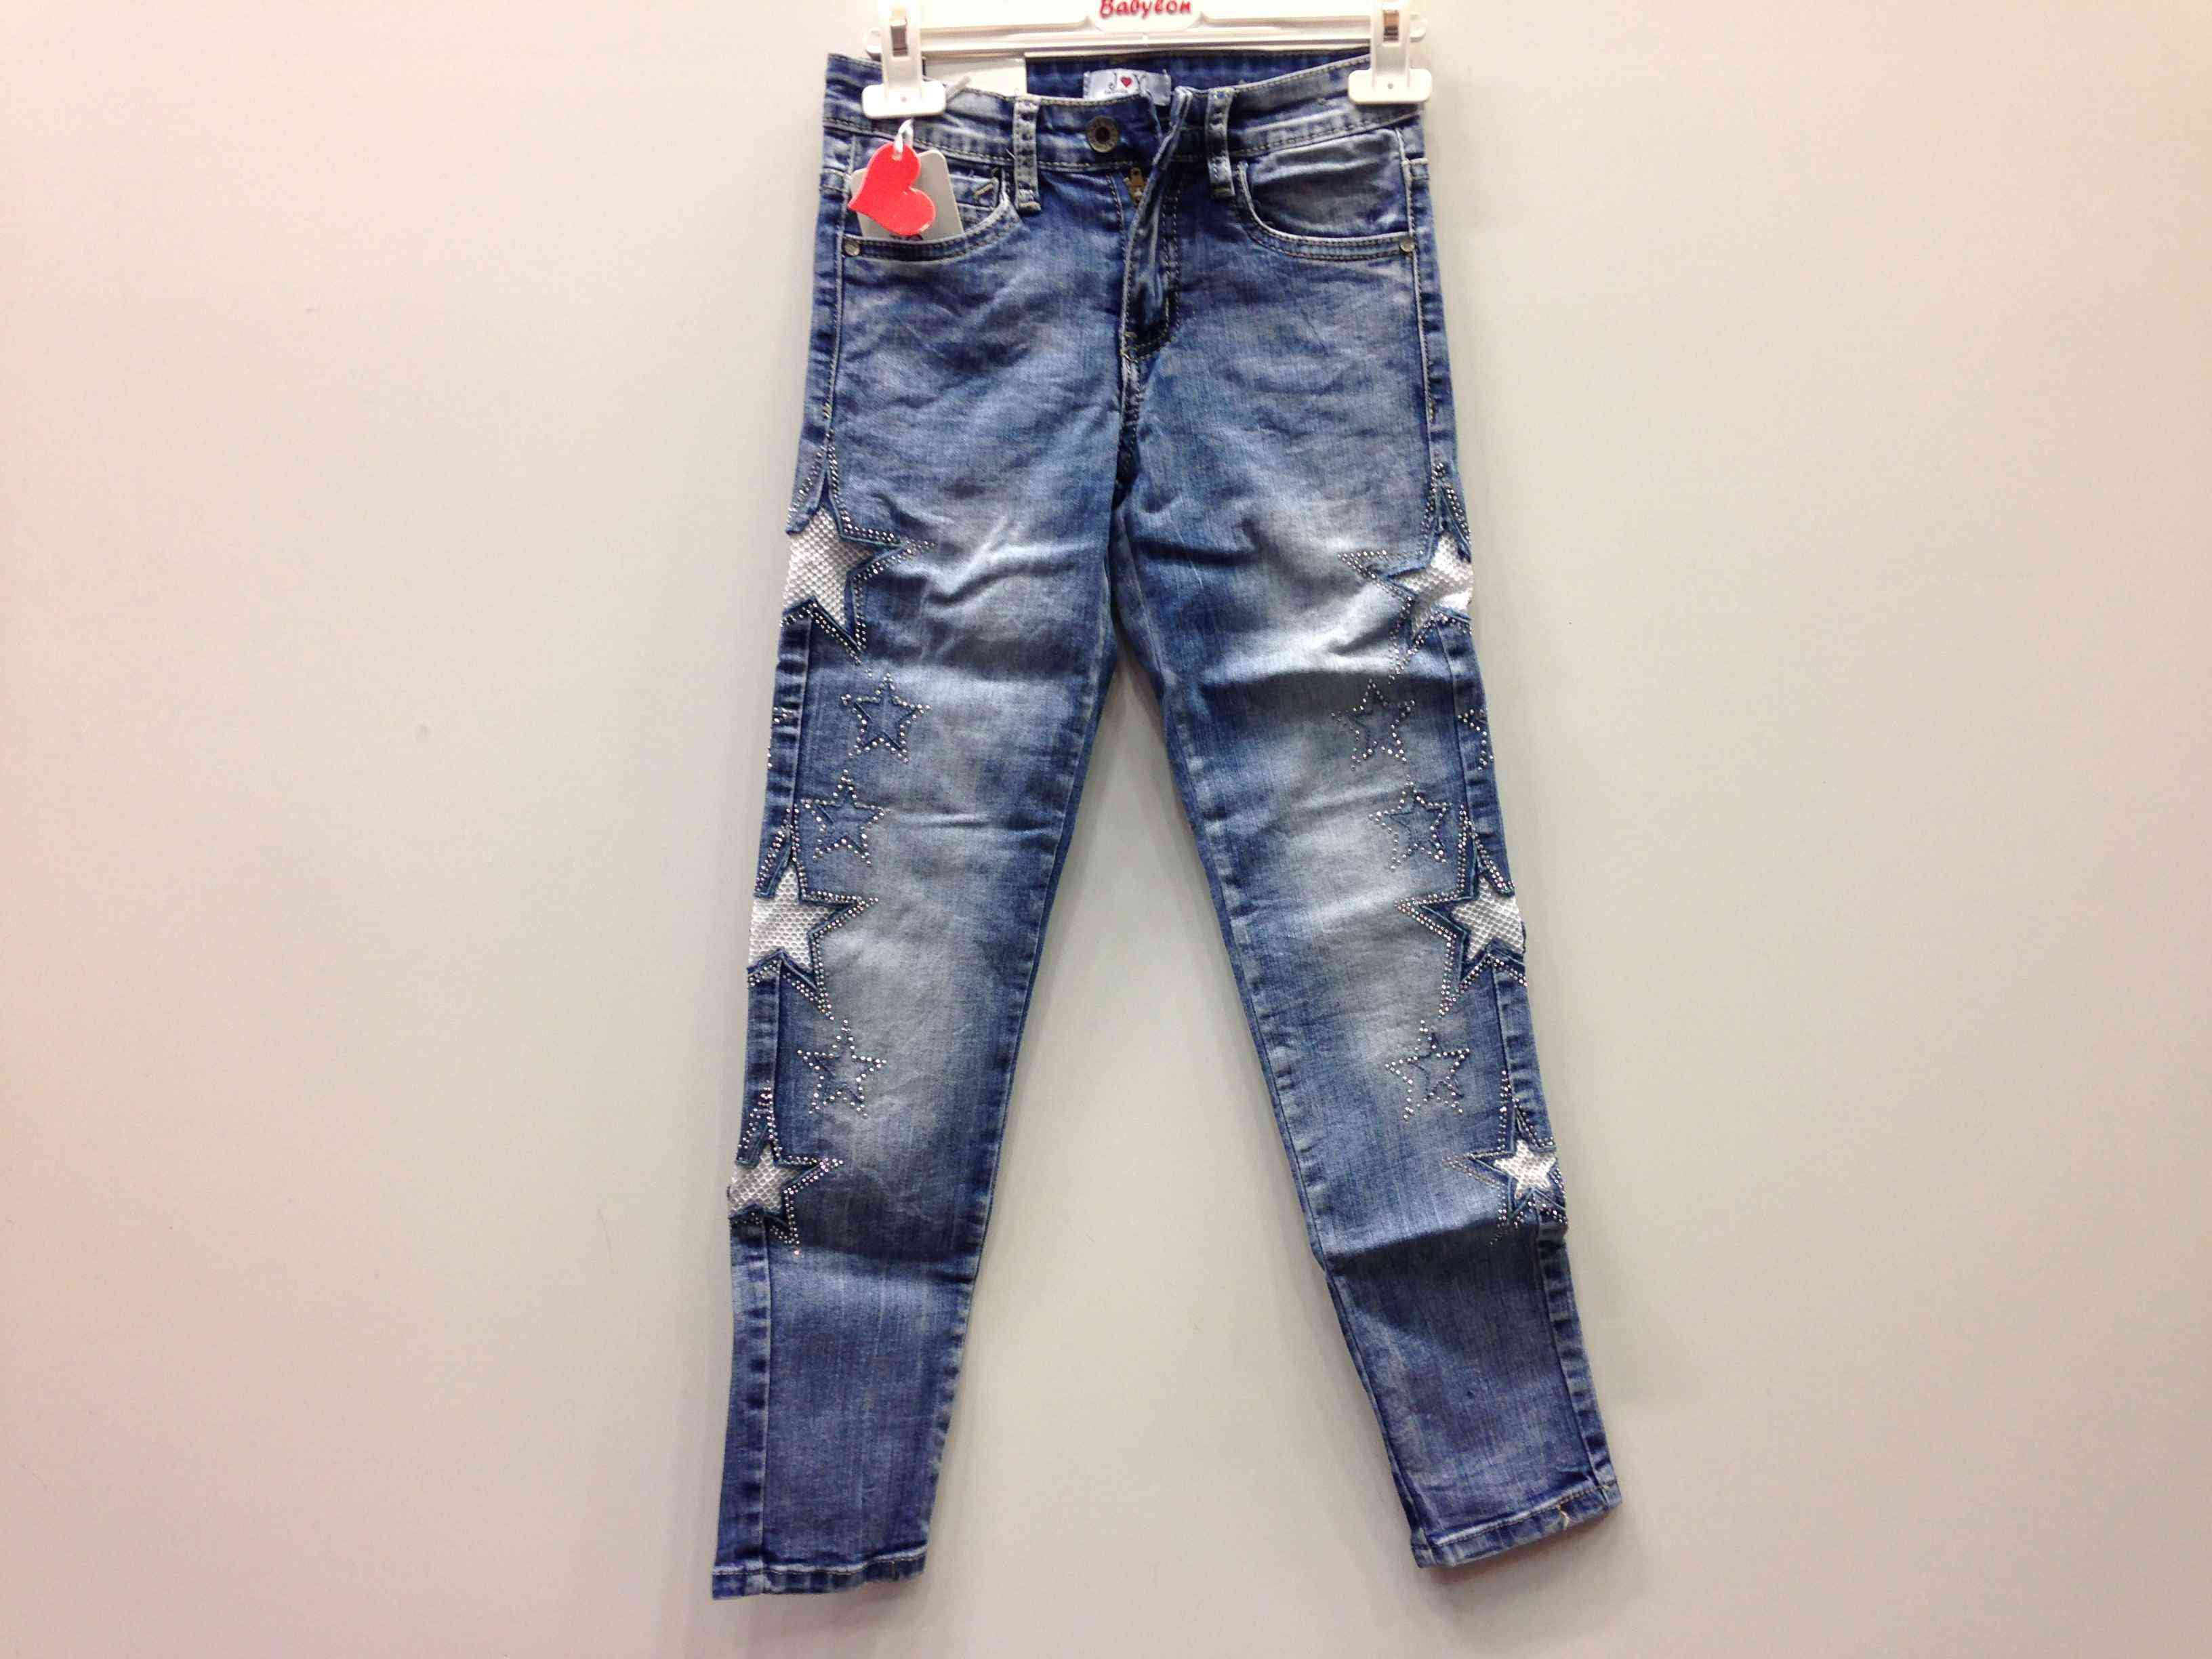 17bdf7ac191 JOY τζιν παντελόνι κορίτσι με τρουκς και αστέρια στο πλάι -